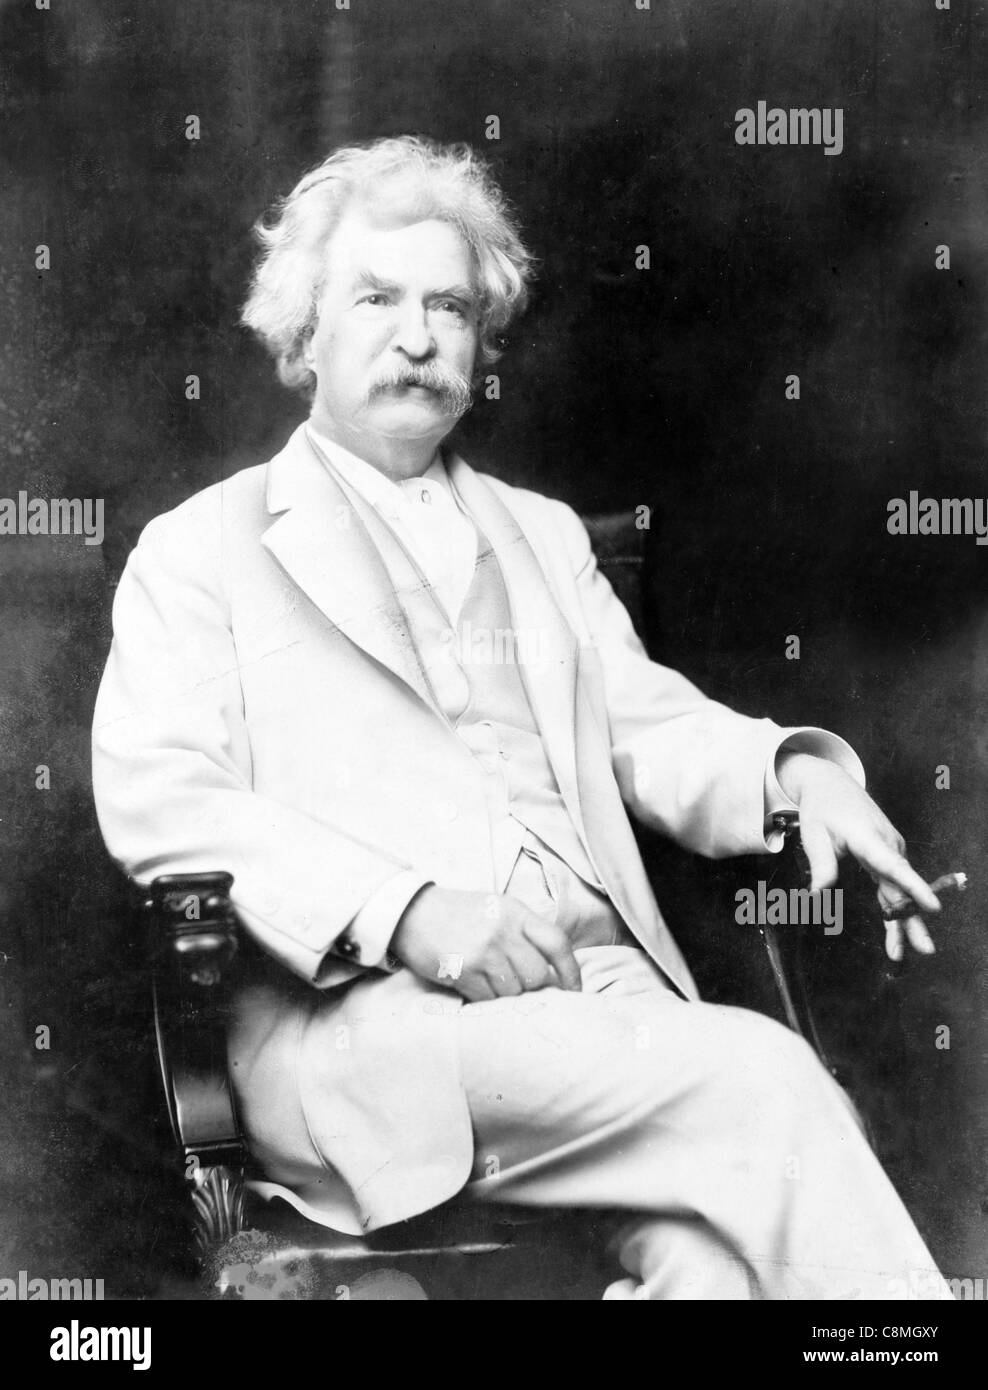 Mark Twain or Samuel Langhorne Clemens - Stock Image